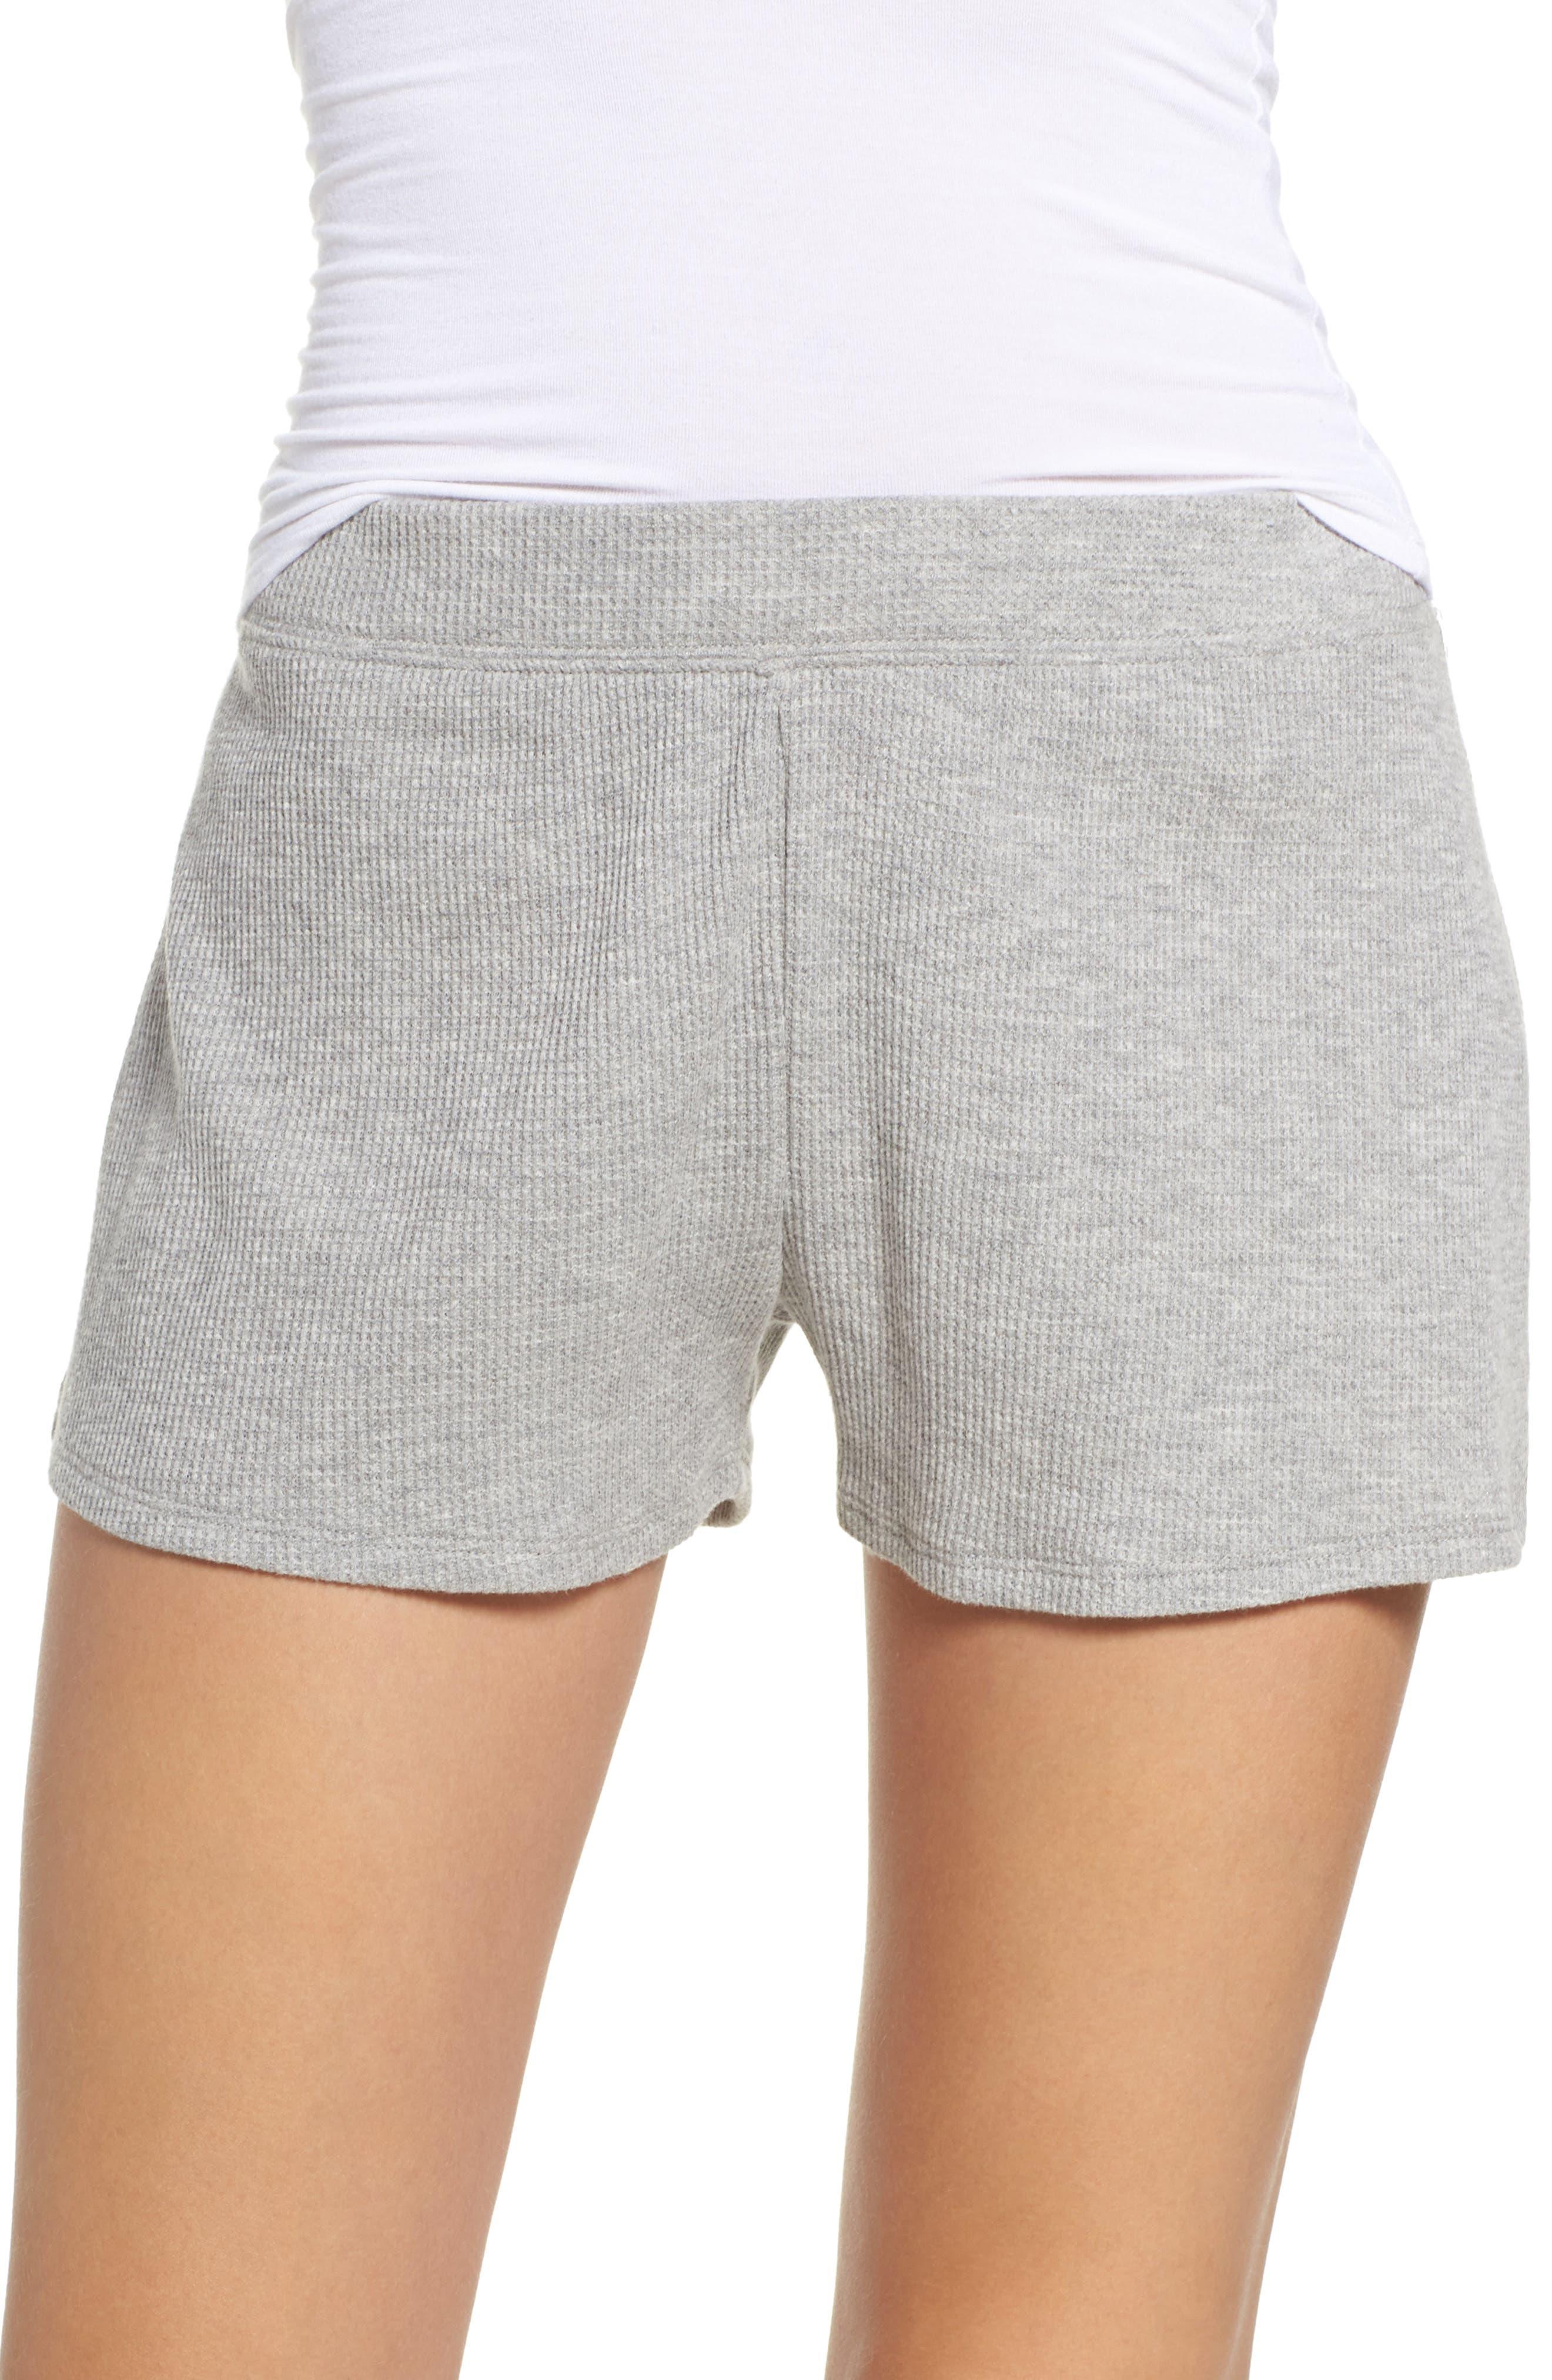 Waffle Knit Lounge Shorts,                         Main,                         color, 020